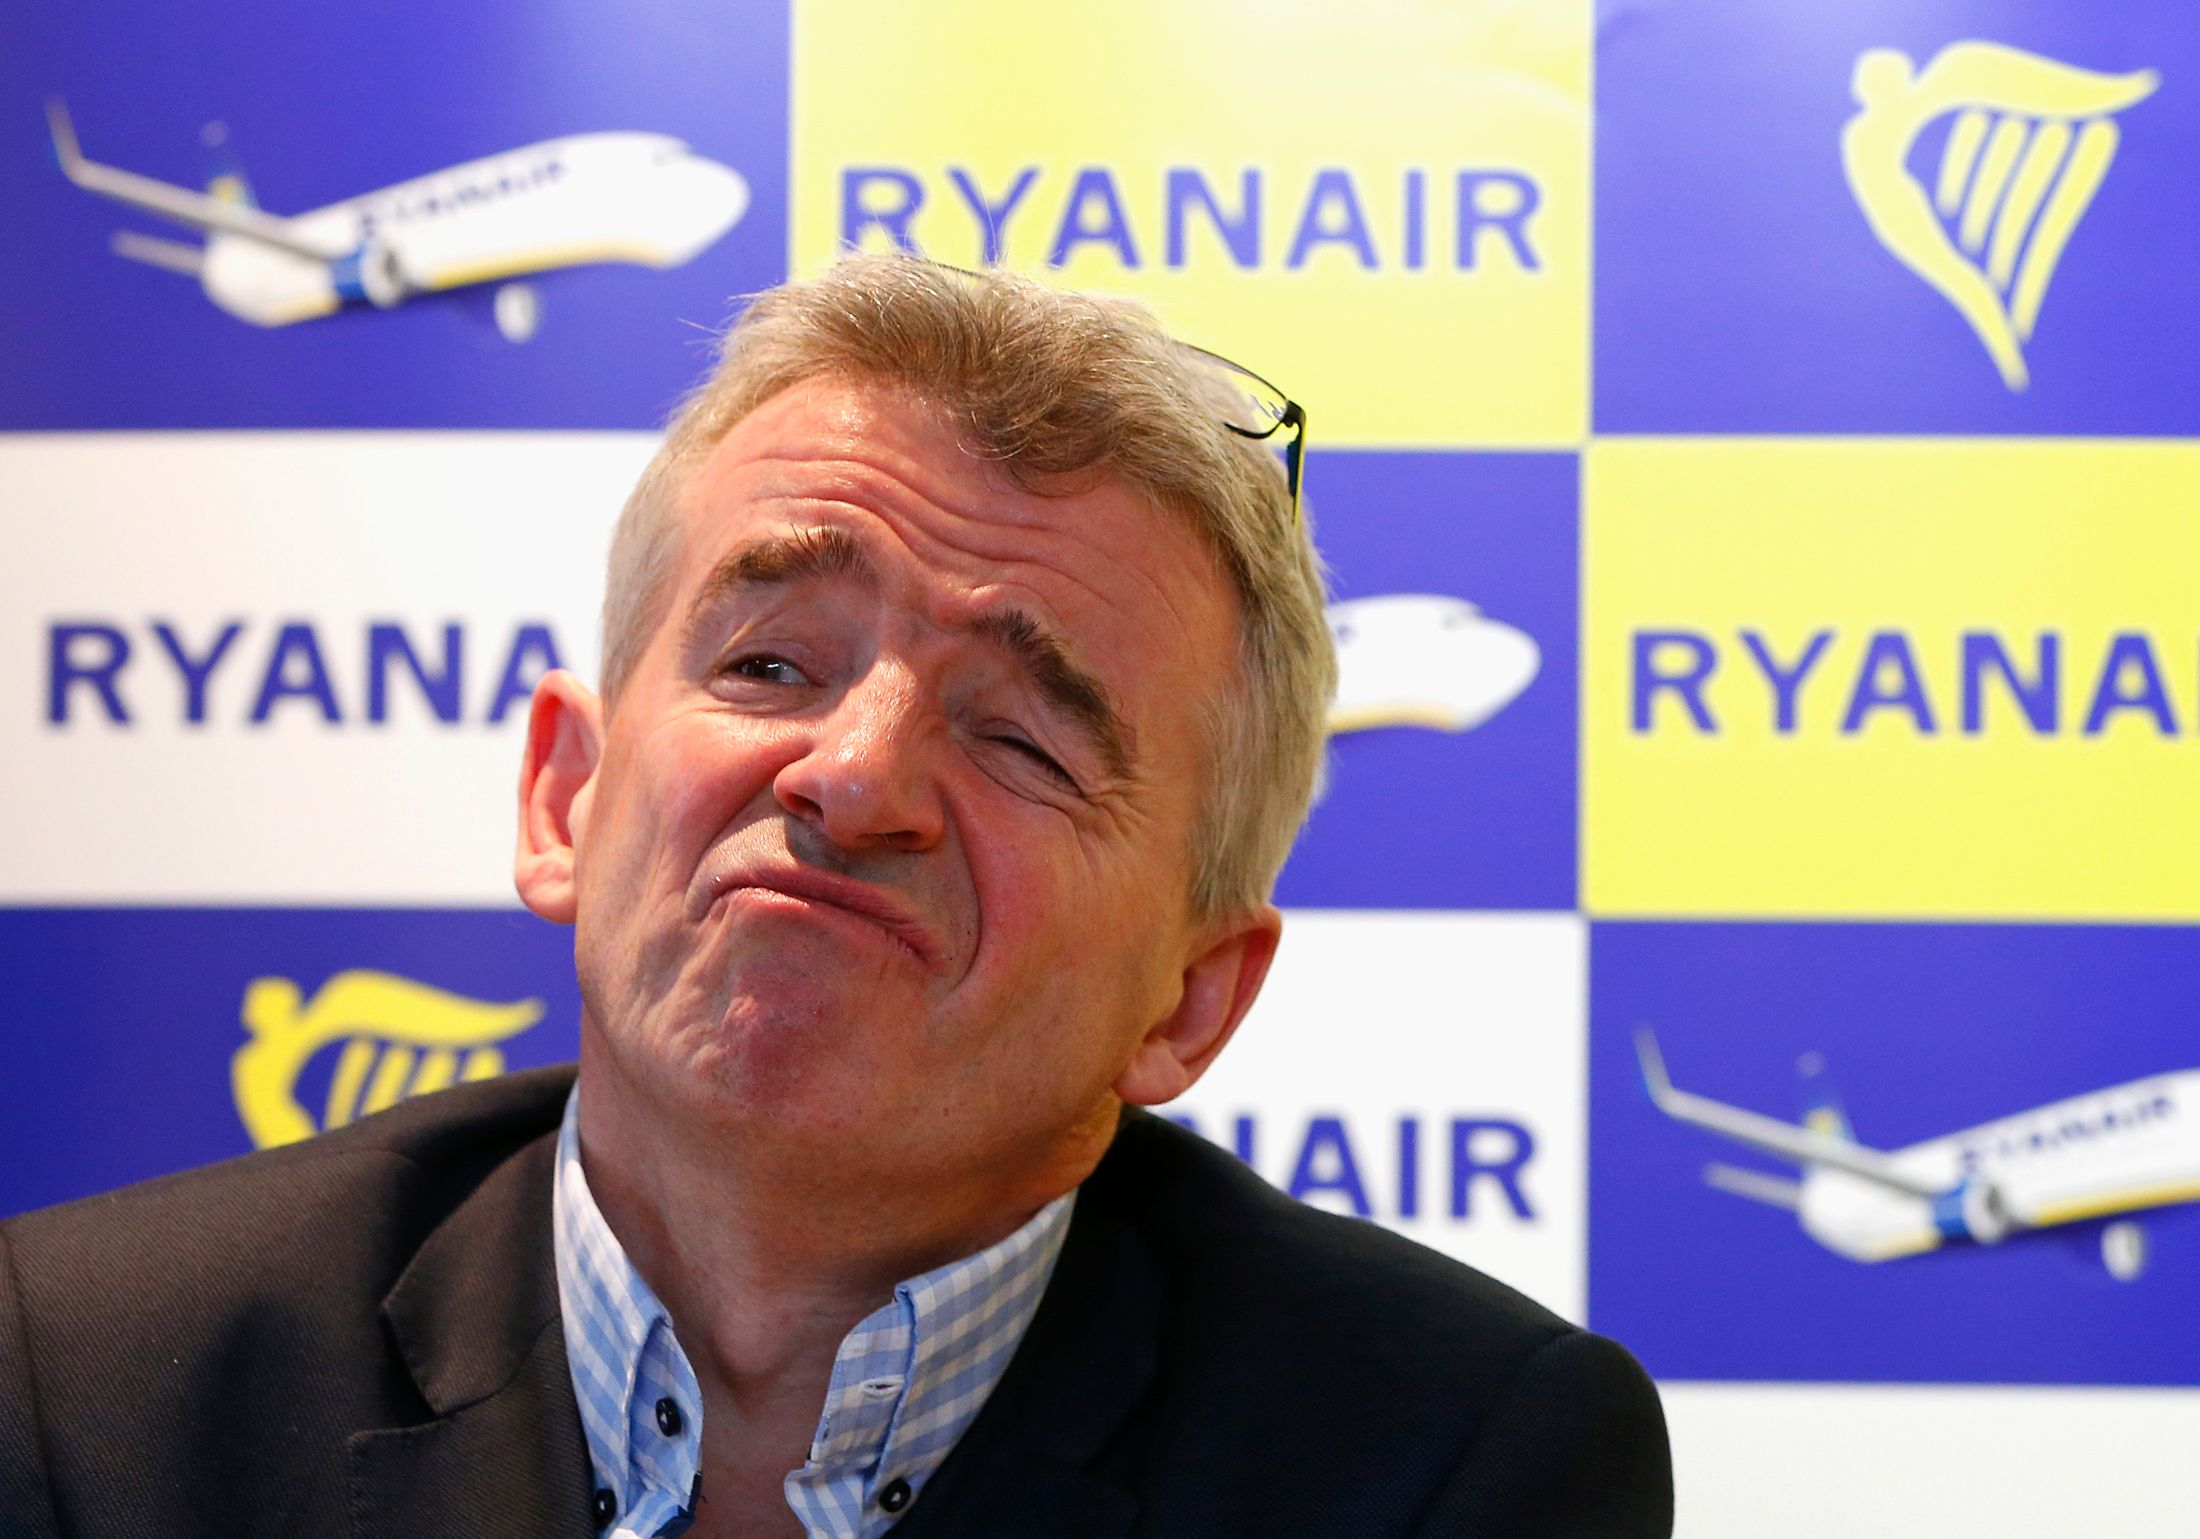 Michael O'Leary, PDG de Ryanair.